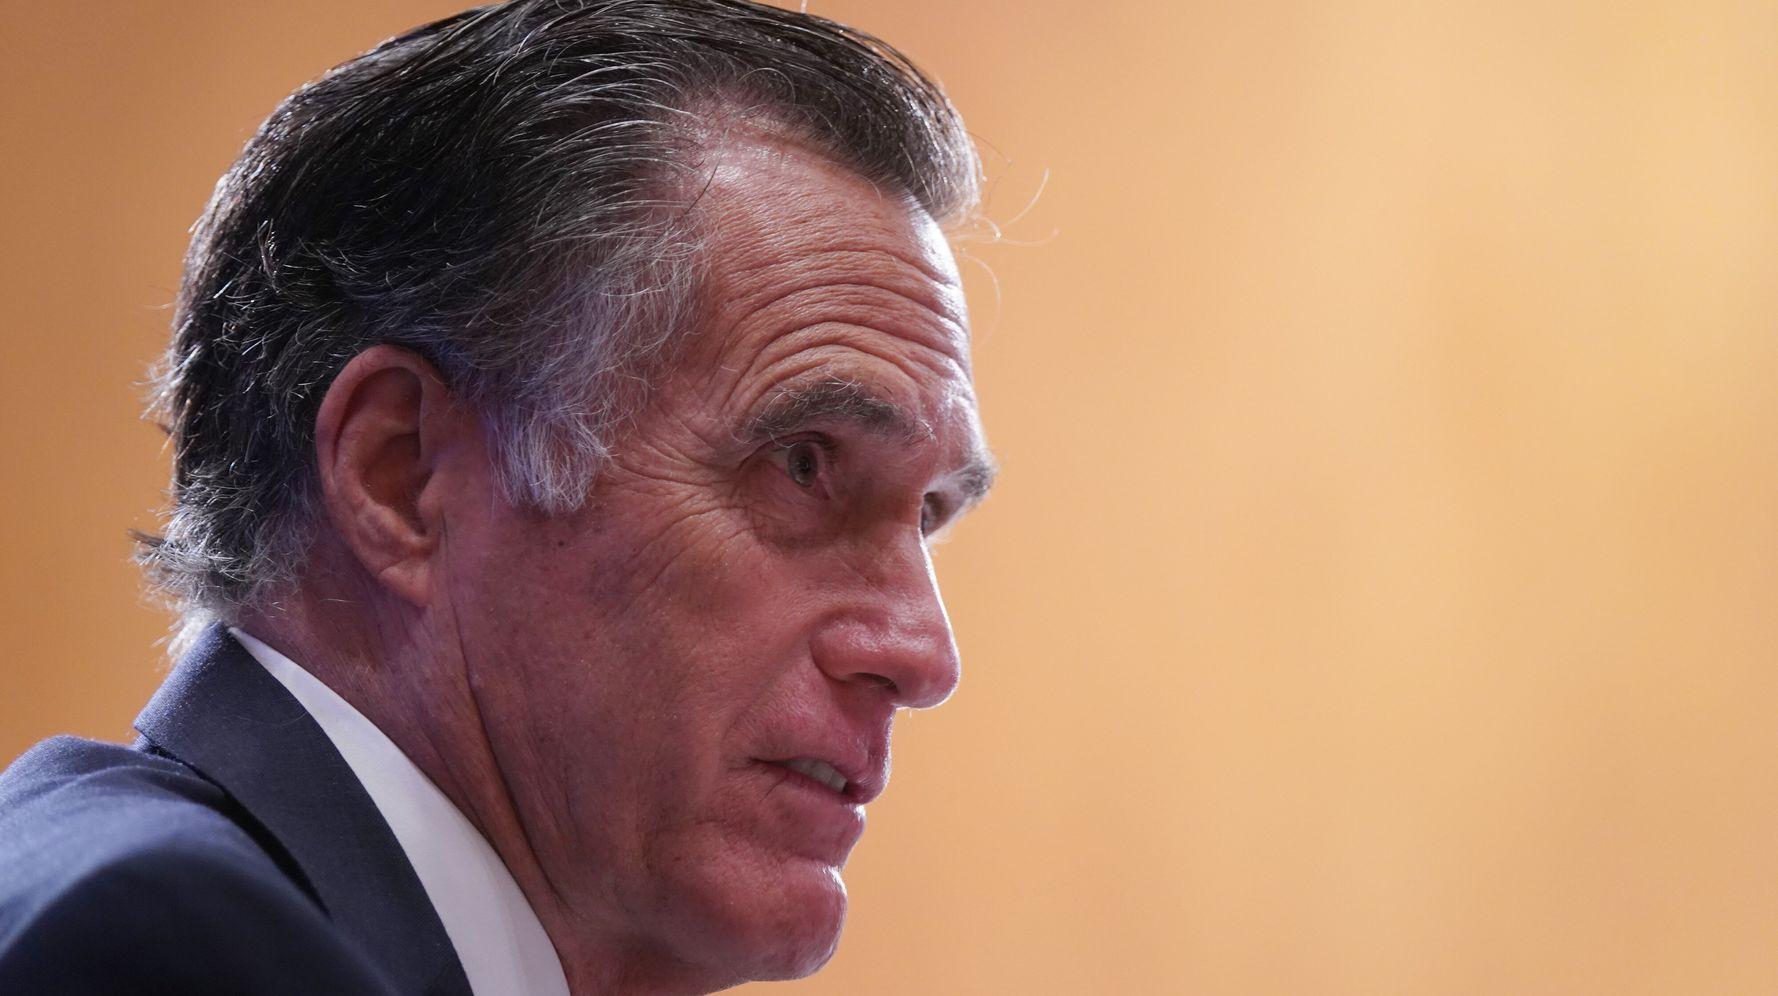 Mitt Romney And Kyrsten Sinema Team Up On Bipartisan Bill To Increase Minimum Wage